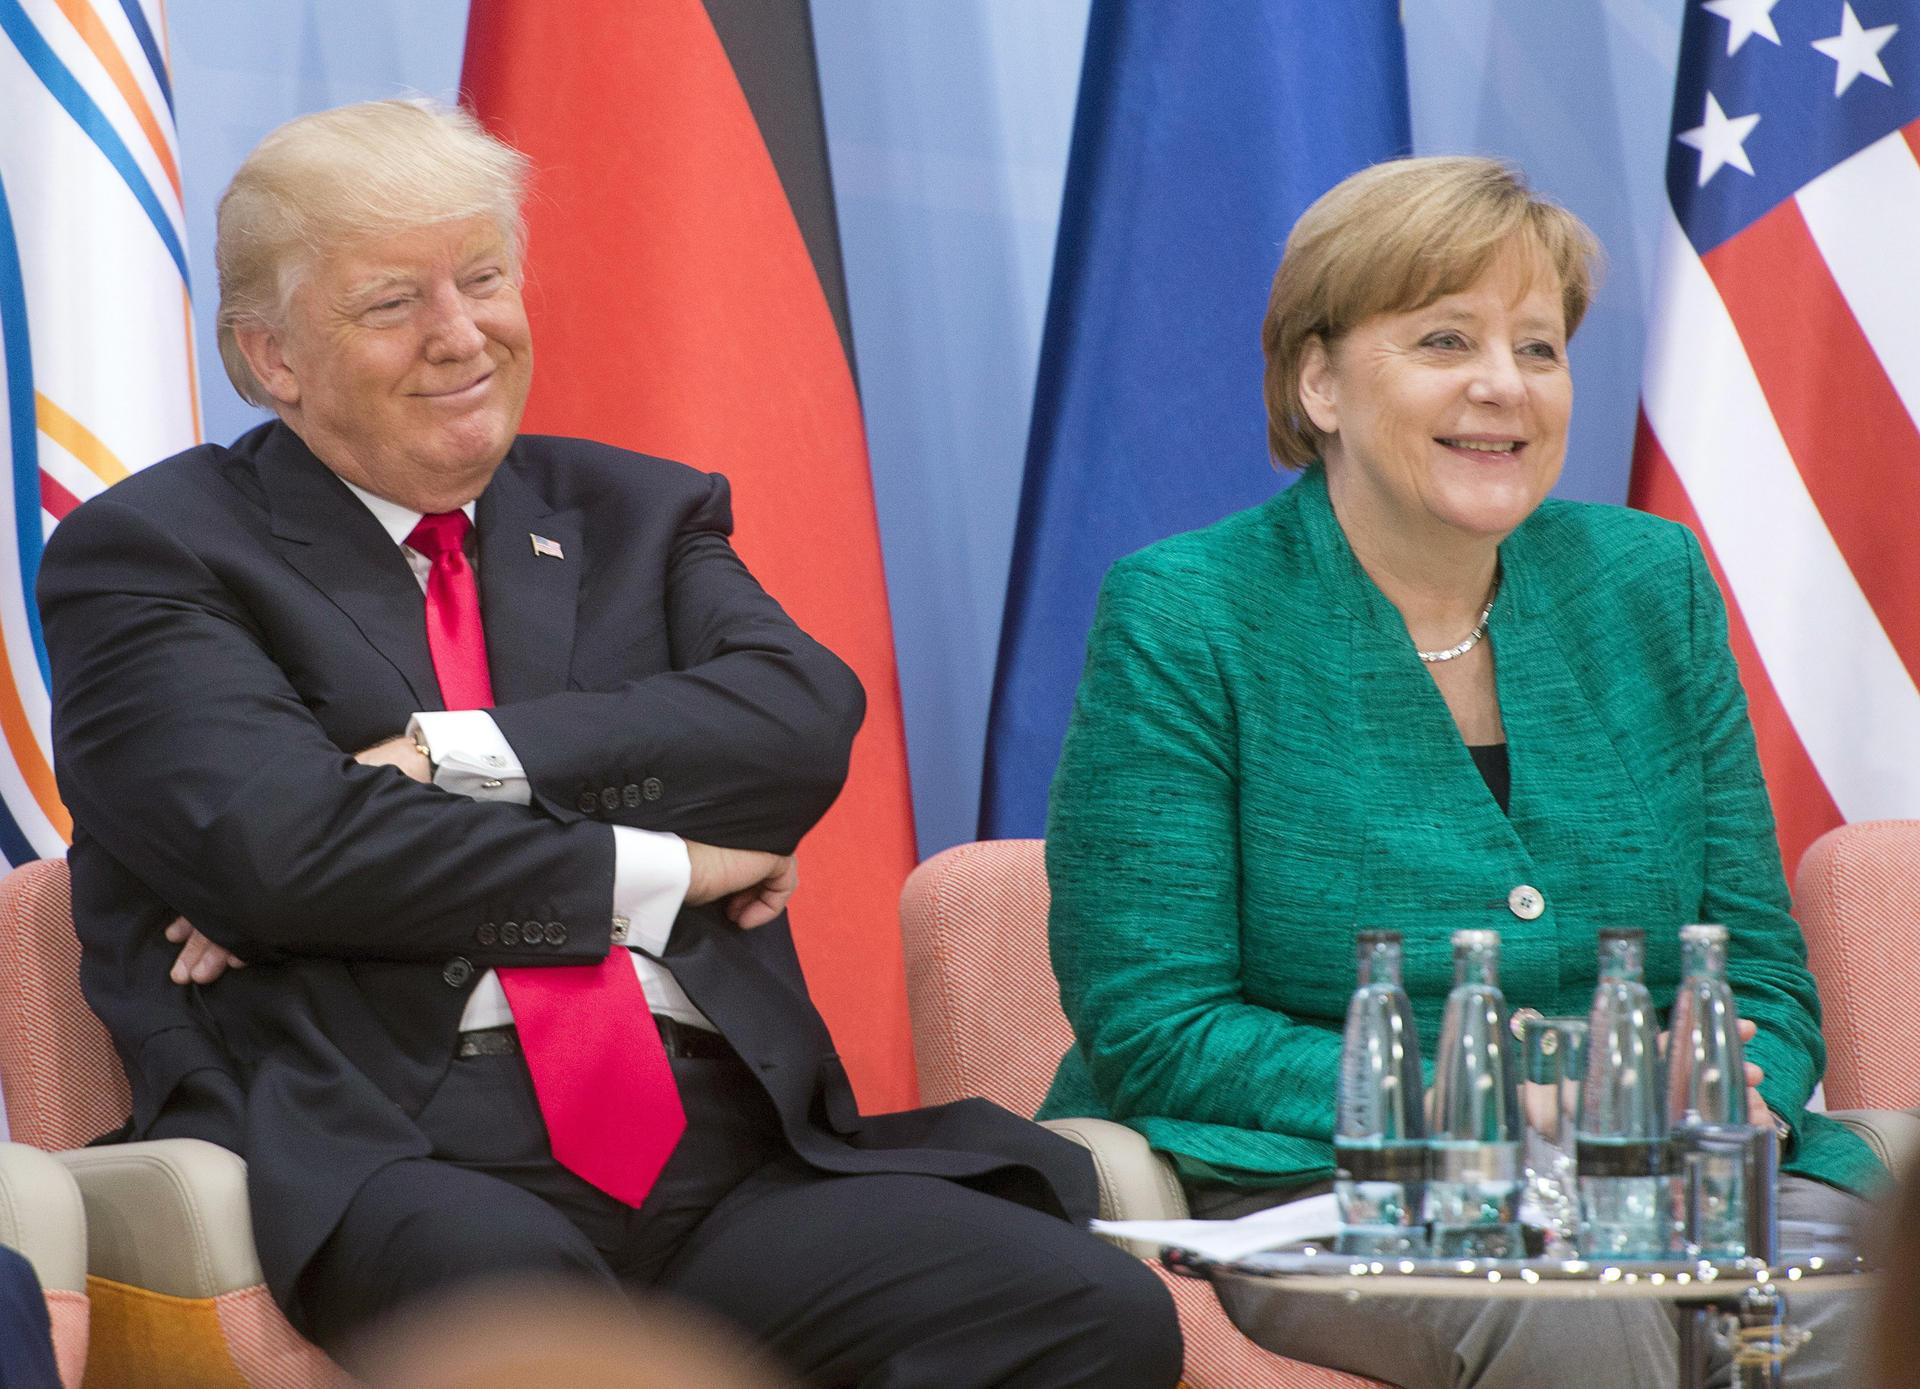 Trump-Europe-trip-07.09.17.jpg